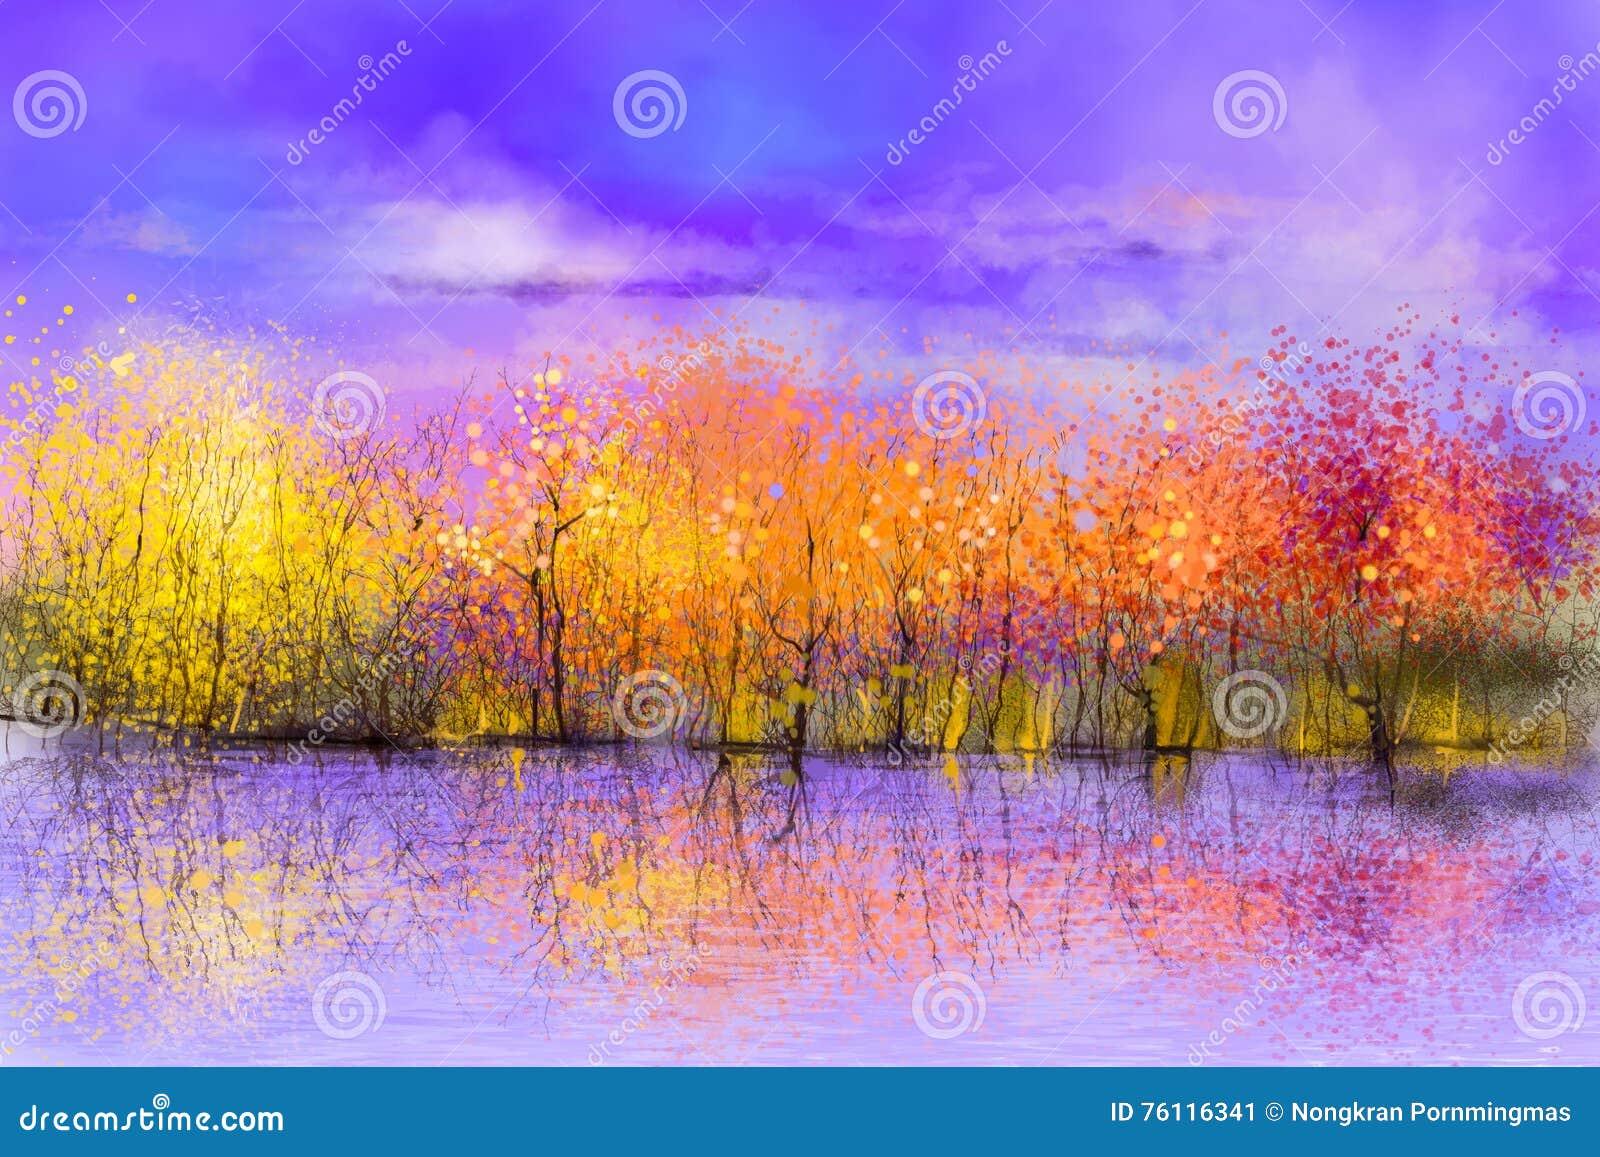 Oil painting colorful autumn landscape background